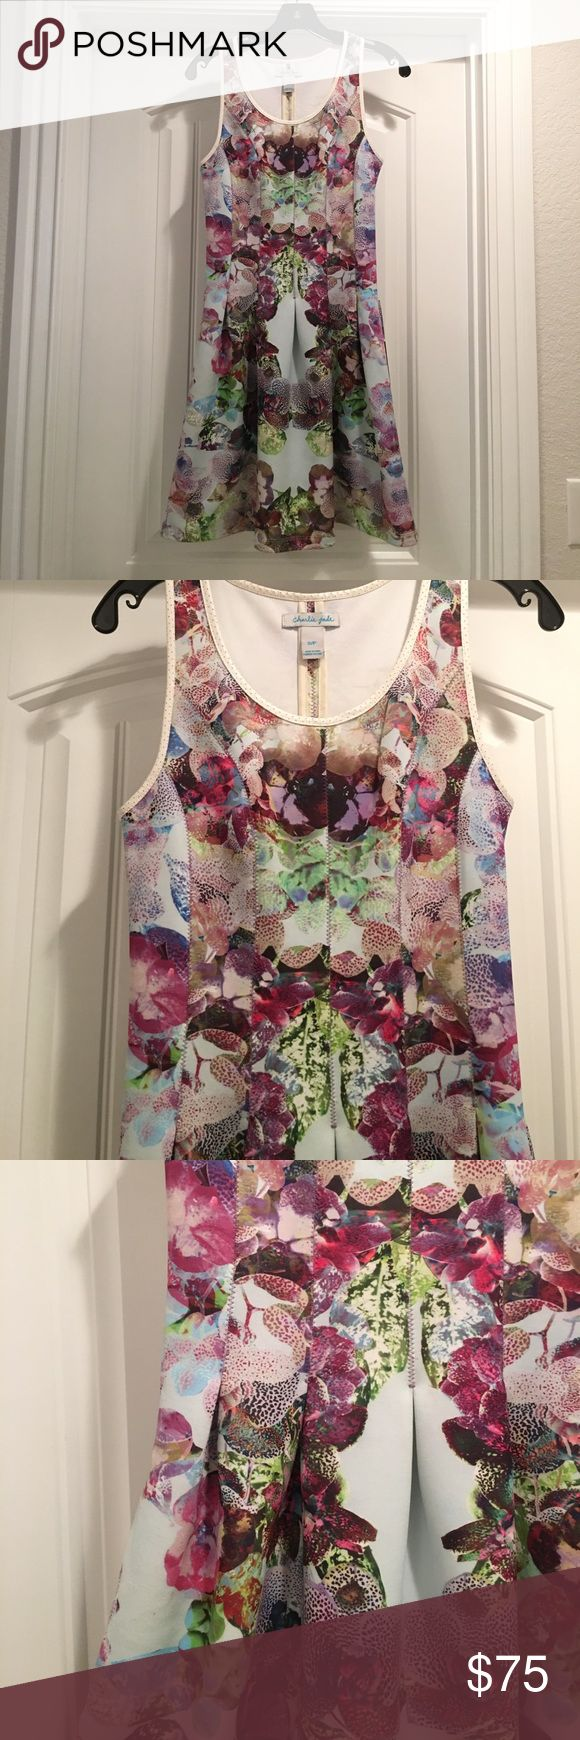 Charlie Jade fit & flare dress Charlie Jade brand. Floral print. Neoprene like material. Pockets! charlie jade Dresses Mini